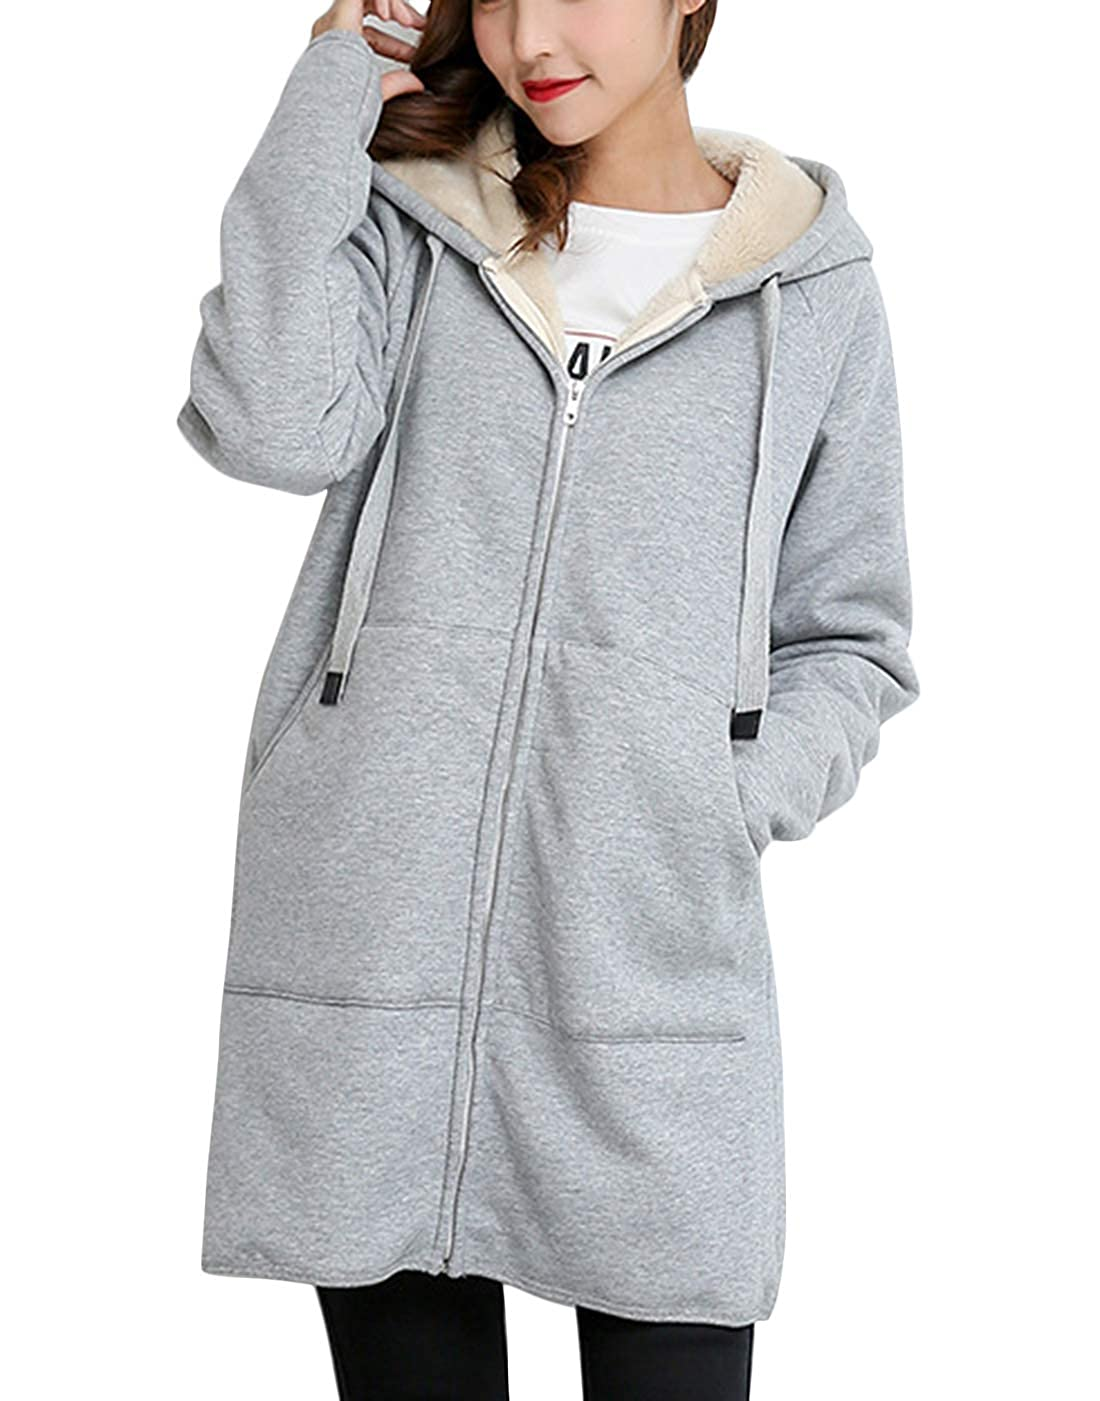 Yeokou Womens Loose Sherpa Lined Zipper Hooded Mid Long Sweatshirt Pocket